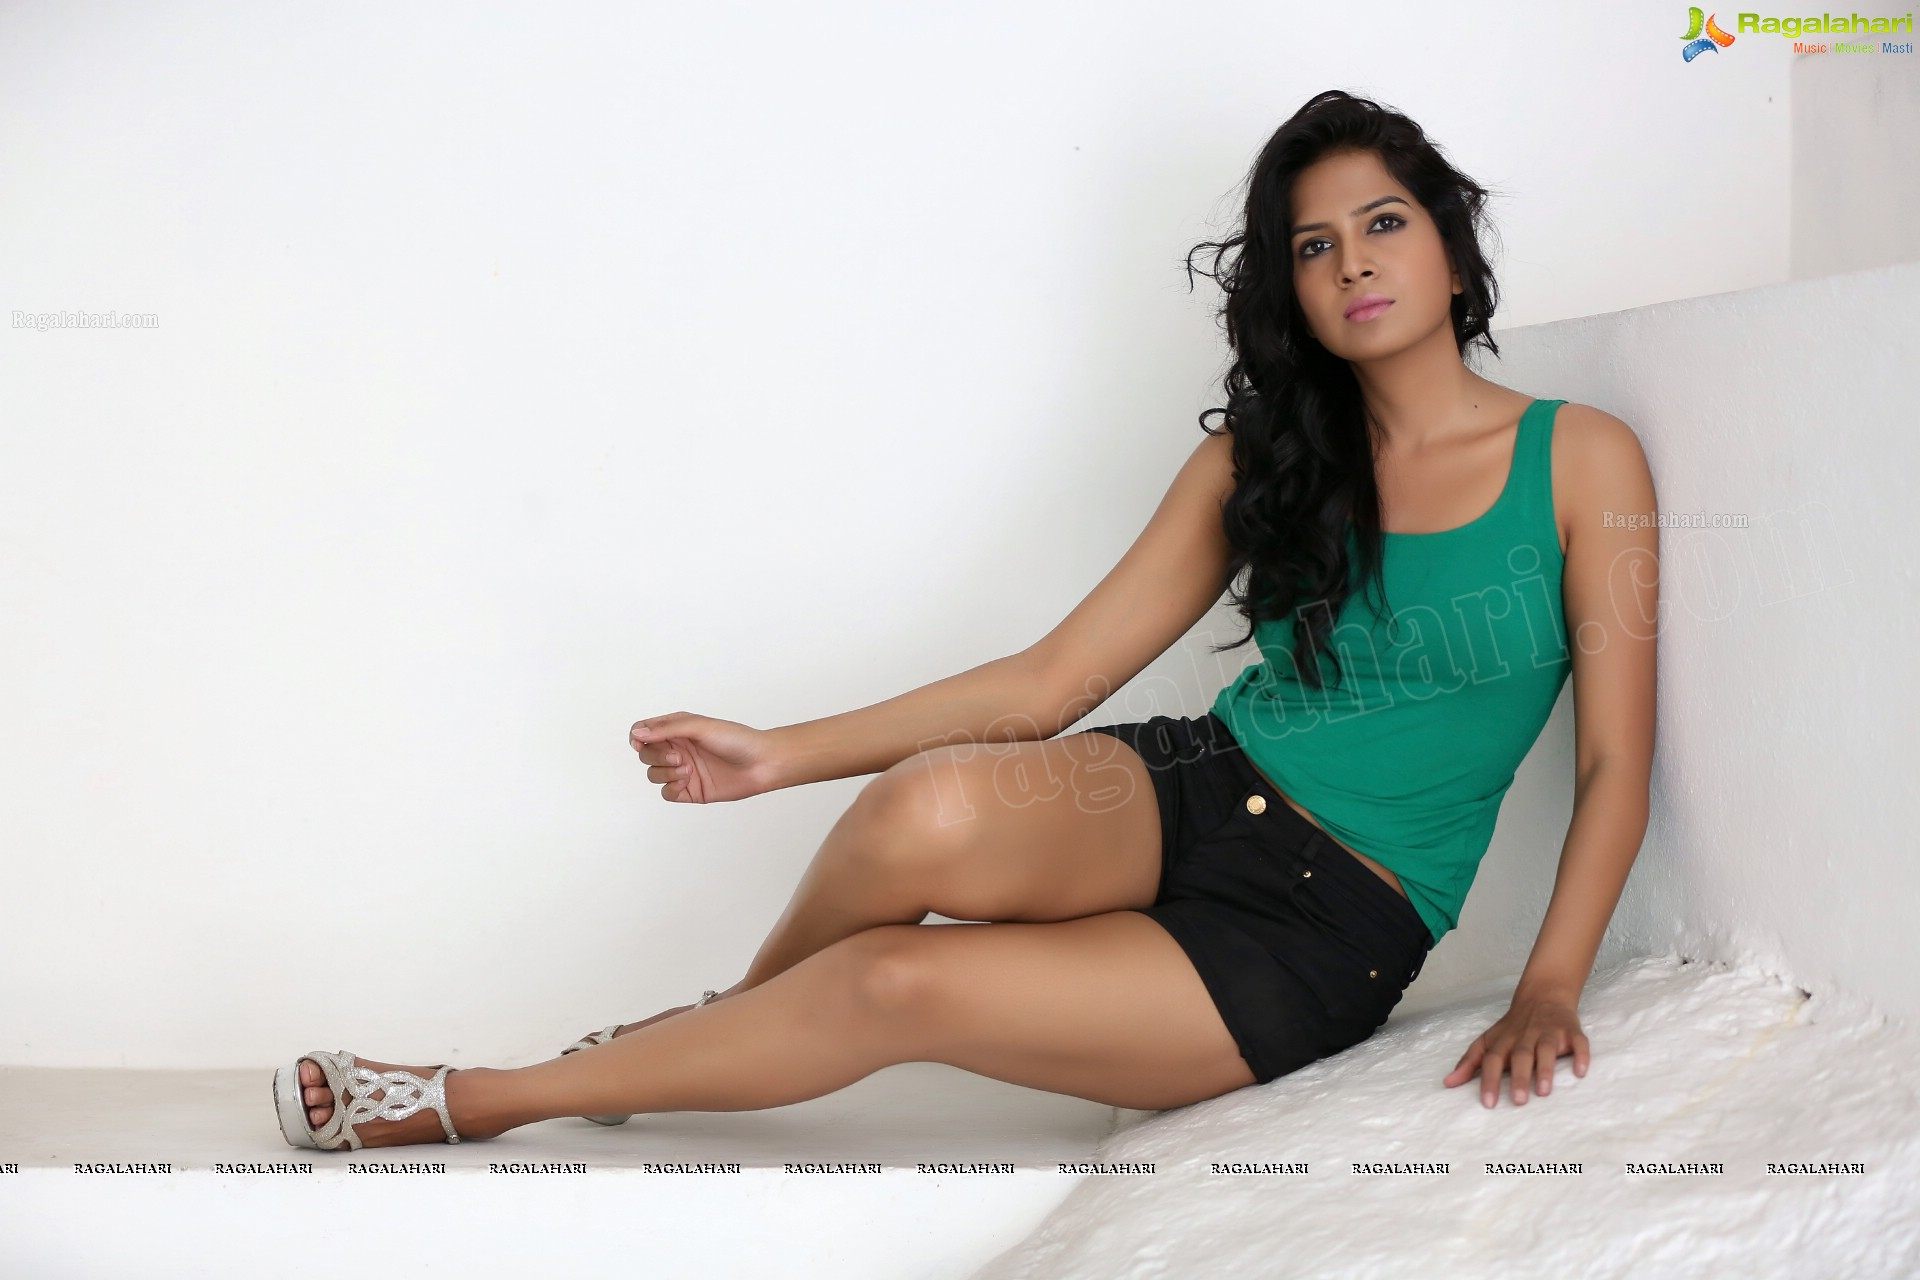 List Of Synonyms And Antonyms Of The Word: Ragalahari Feet